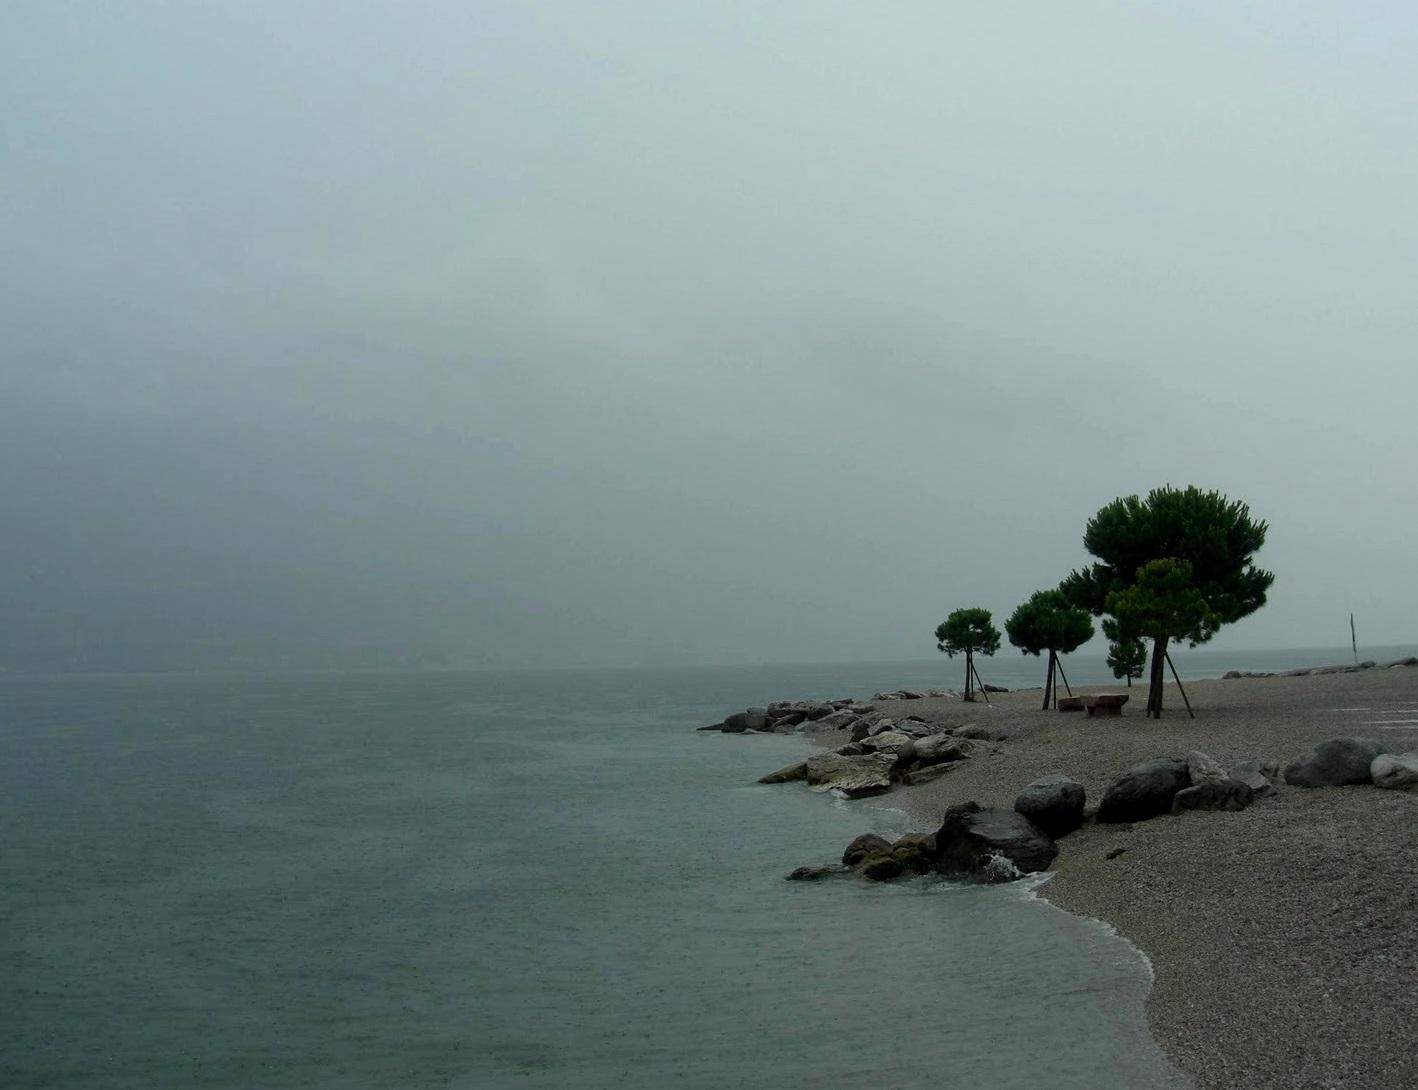 Lago di Garda | www.jclynmtrk.com